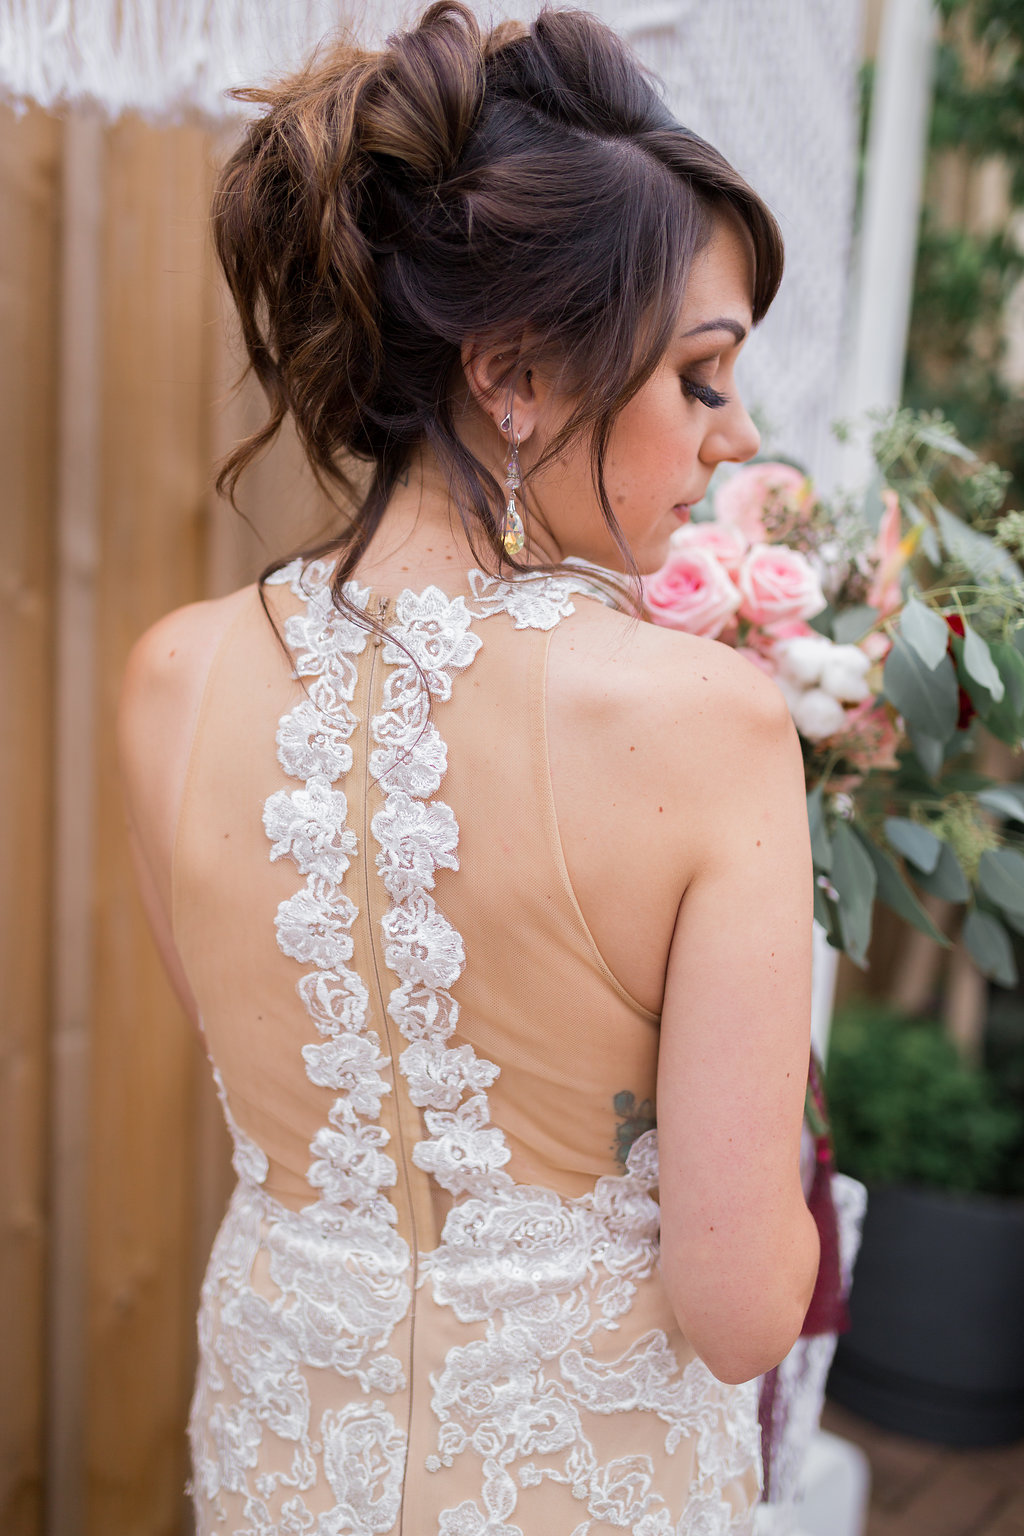 DianaB_WeddingTrends_2018_471.jpg